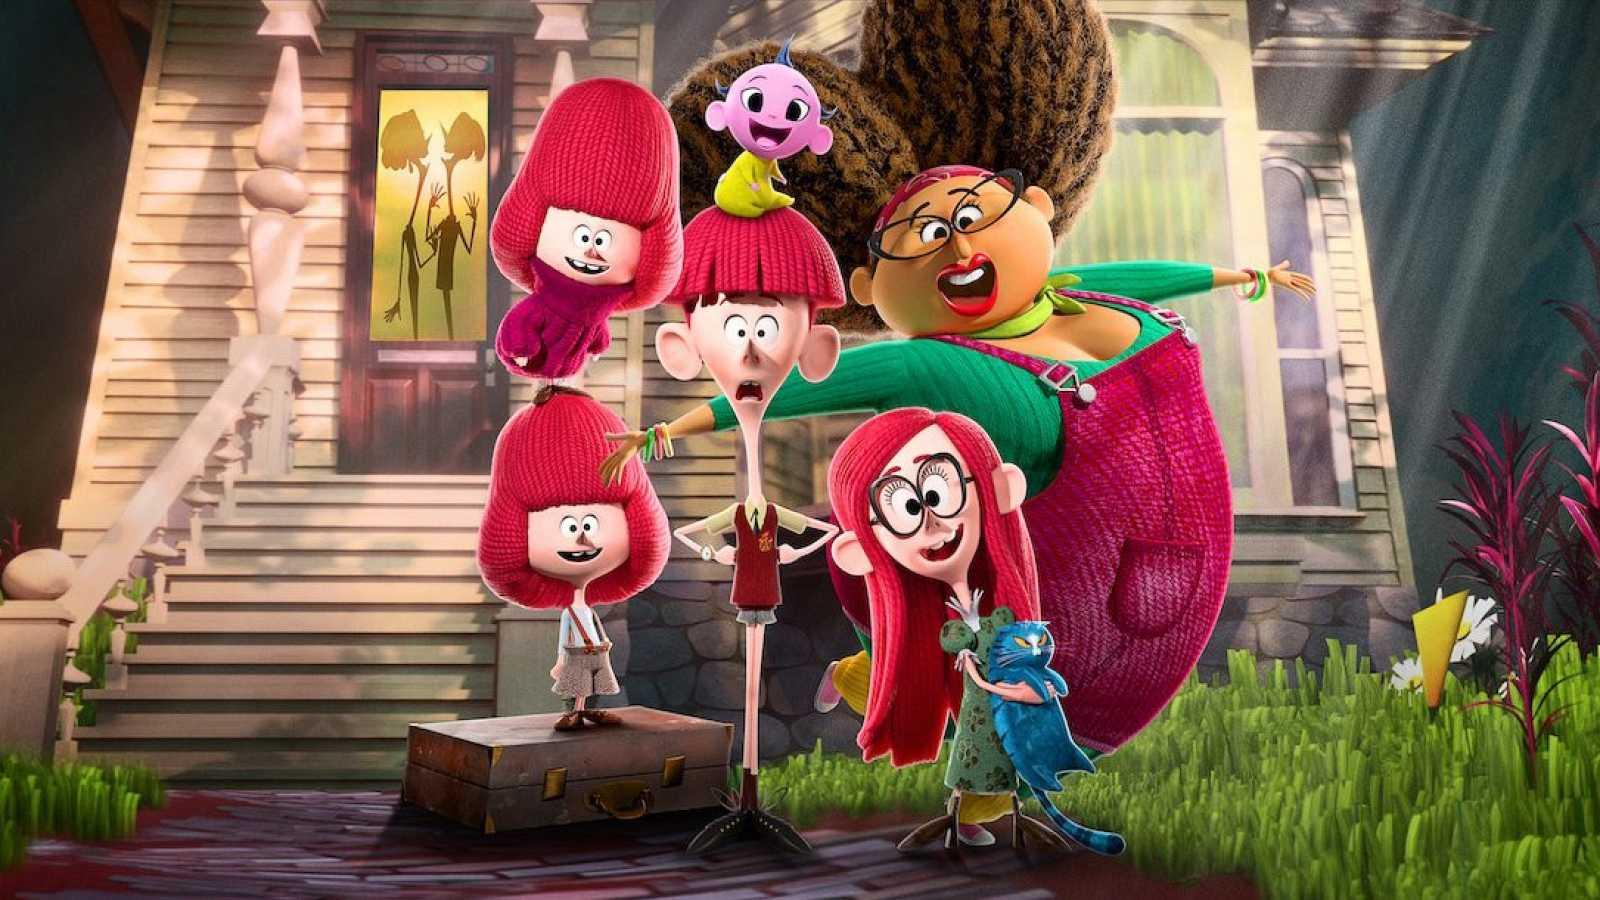 Marca España - España cantera del sector de la animación internacional - 27/04/21 - escuchar ahora